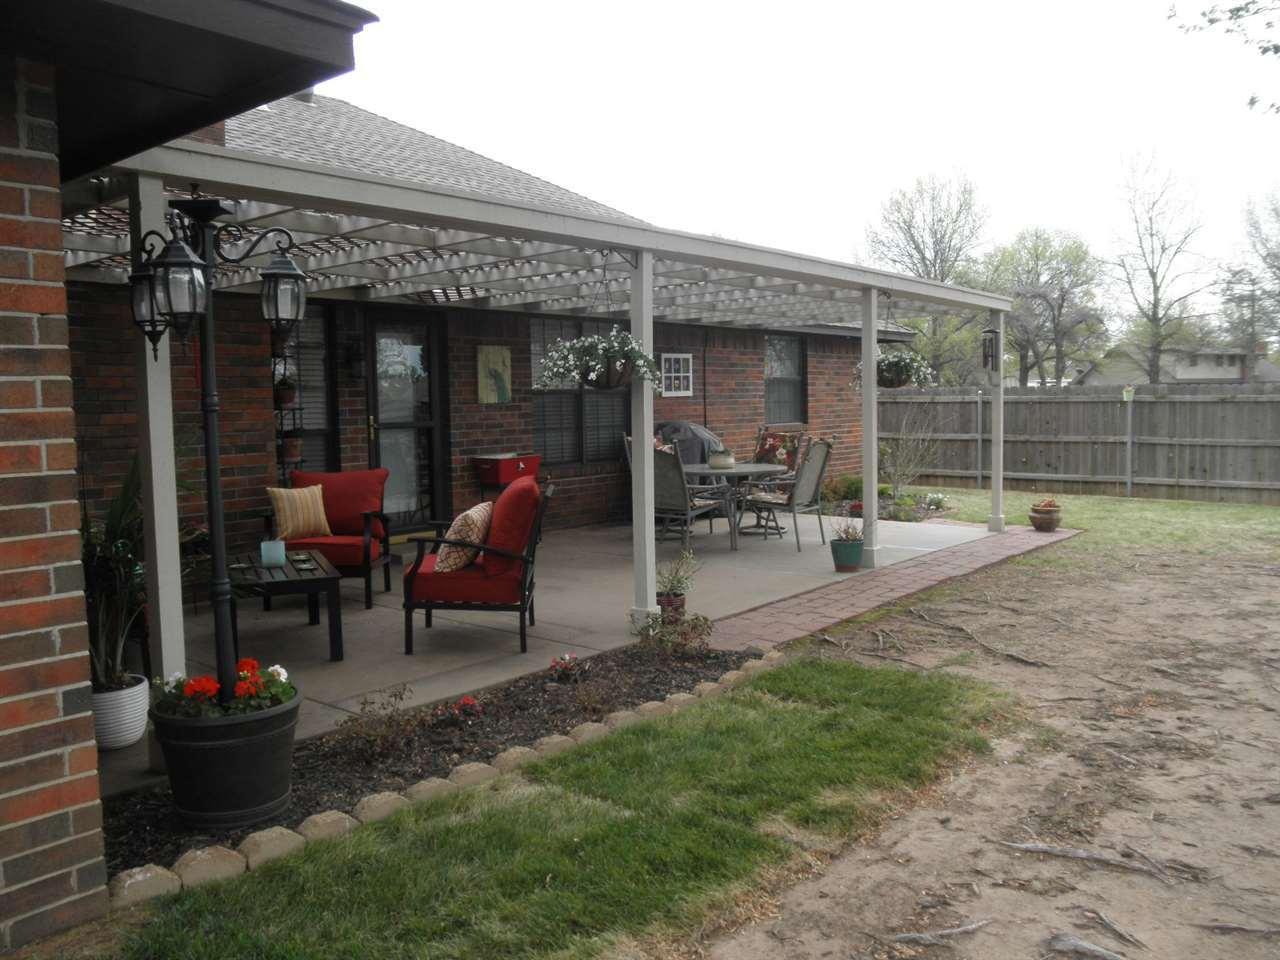 Sold Intraoffice W/MLS | 2800 Green Meadow Ponca City, OK 74604 26